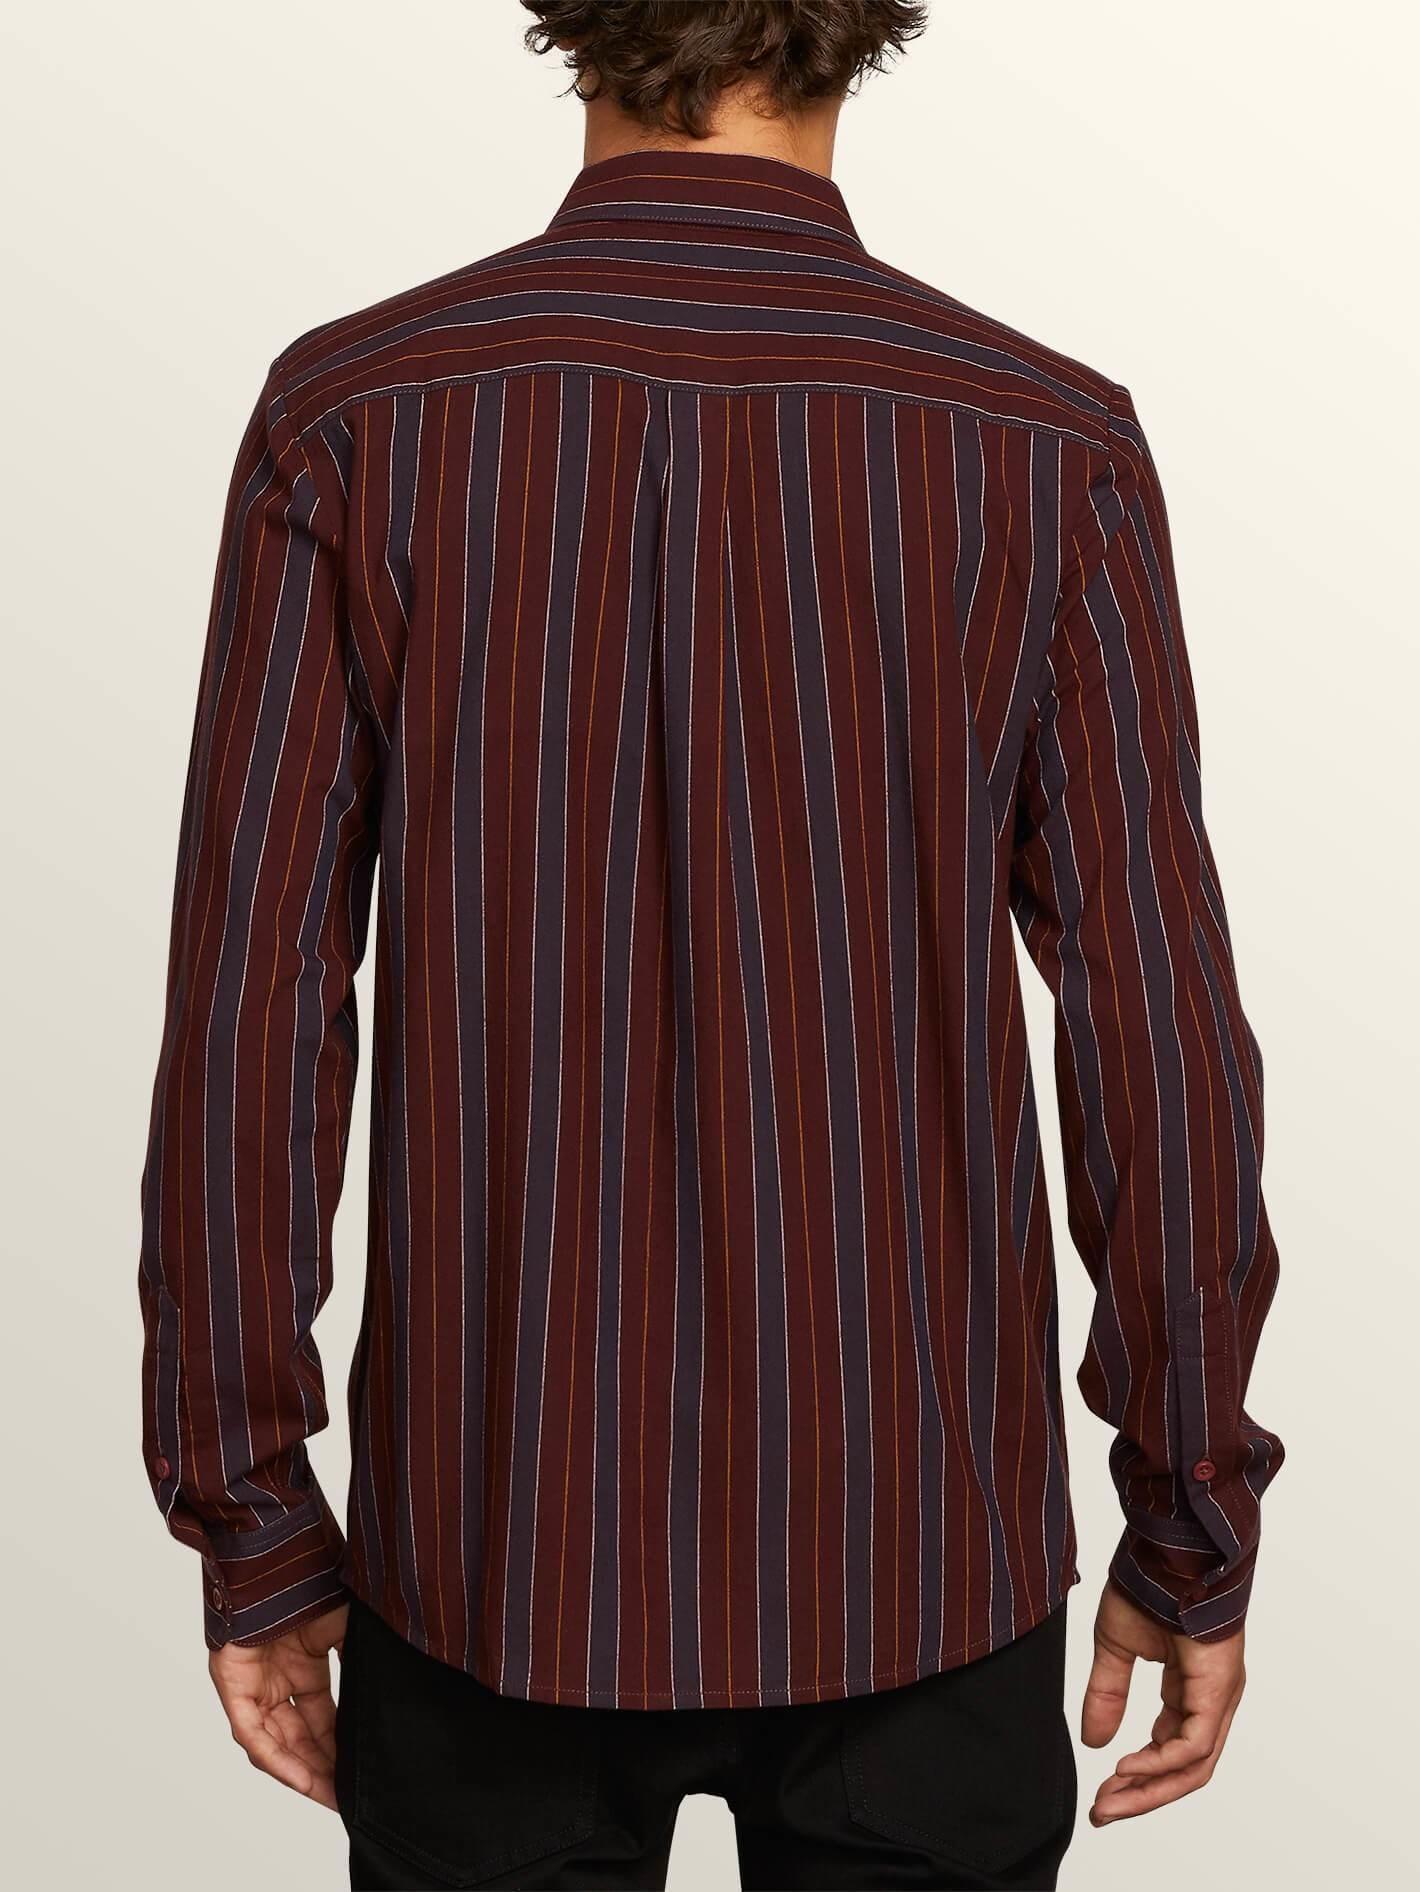 Volcom Clasher Long Sleeve Shirt